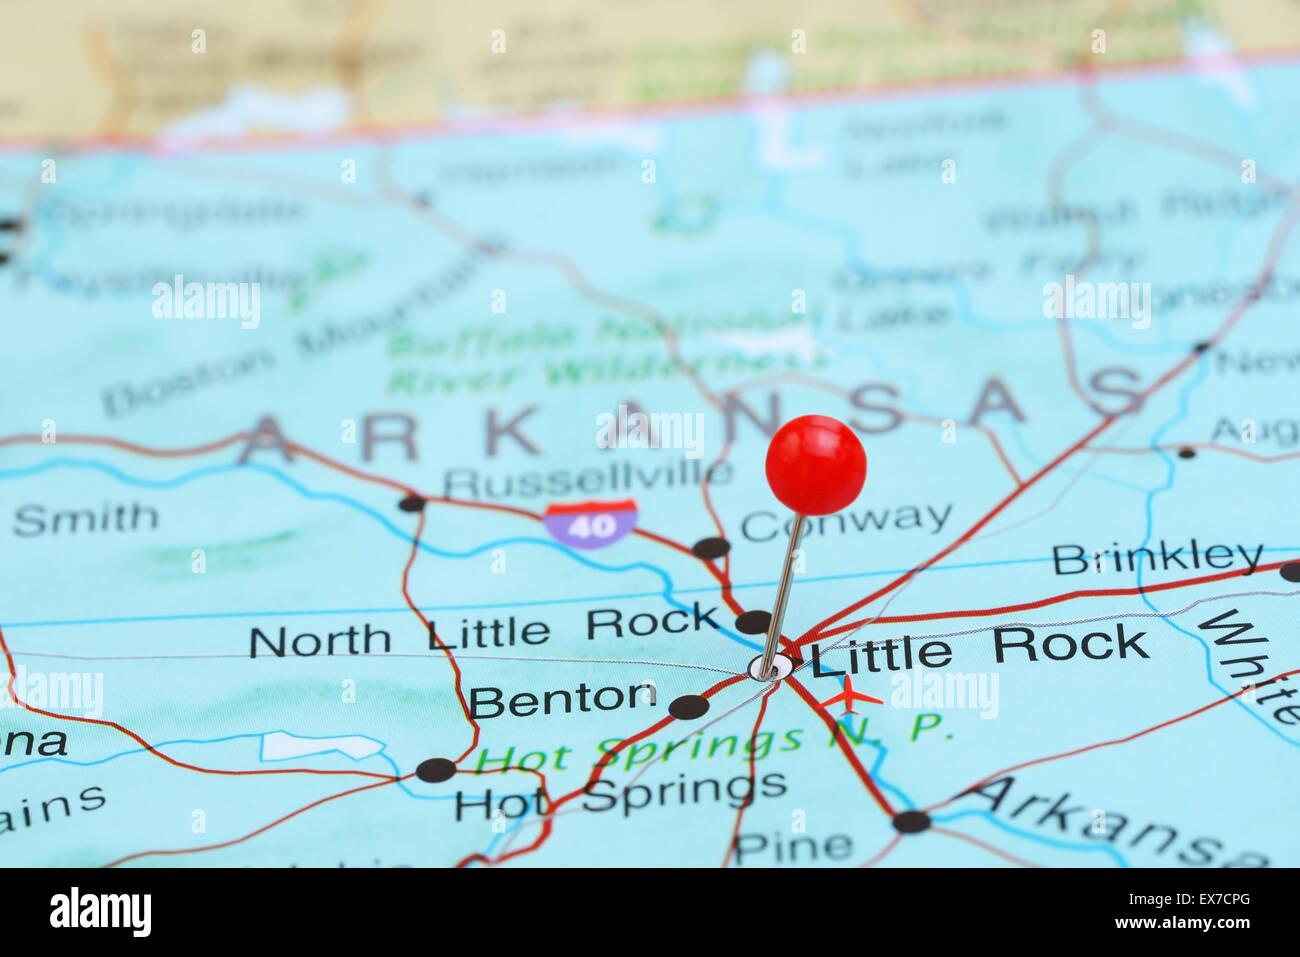 Little Rock Pinned On Map Stockfotos & Little Rock Pinned On Map ...